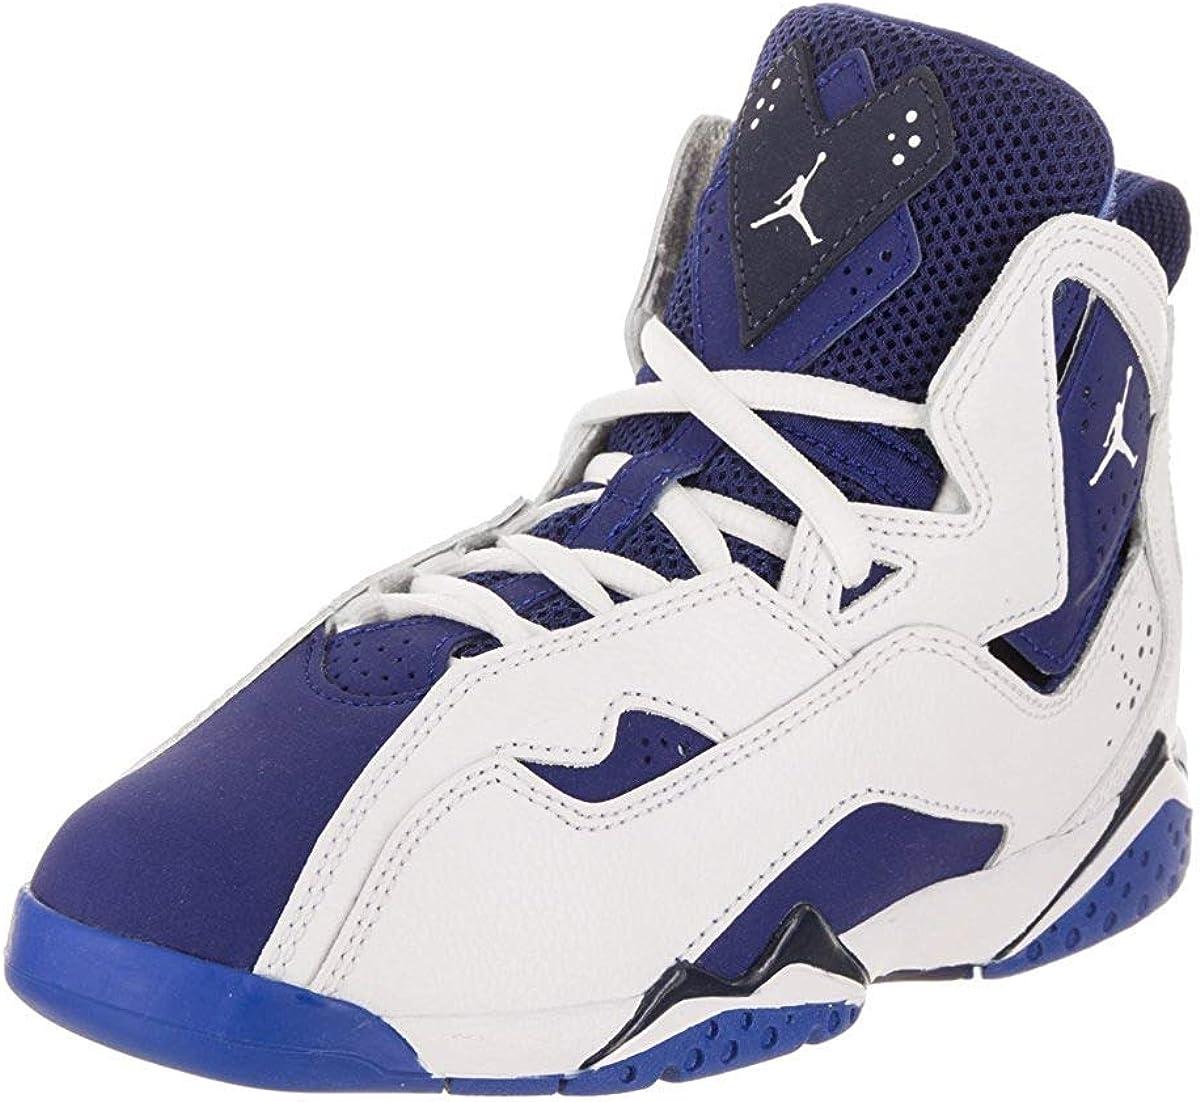 Nike Jordan True Flight BP Boys Fashion